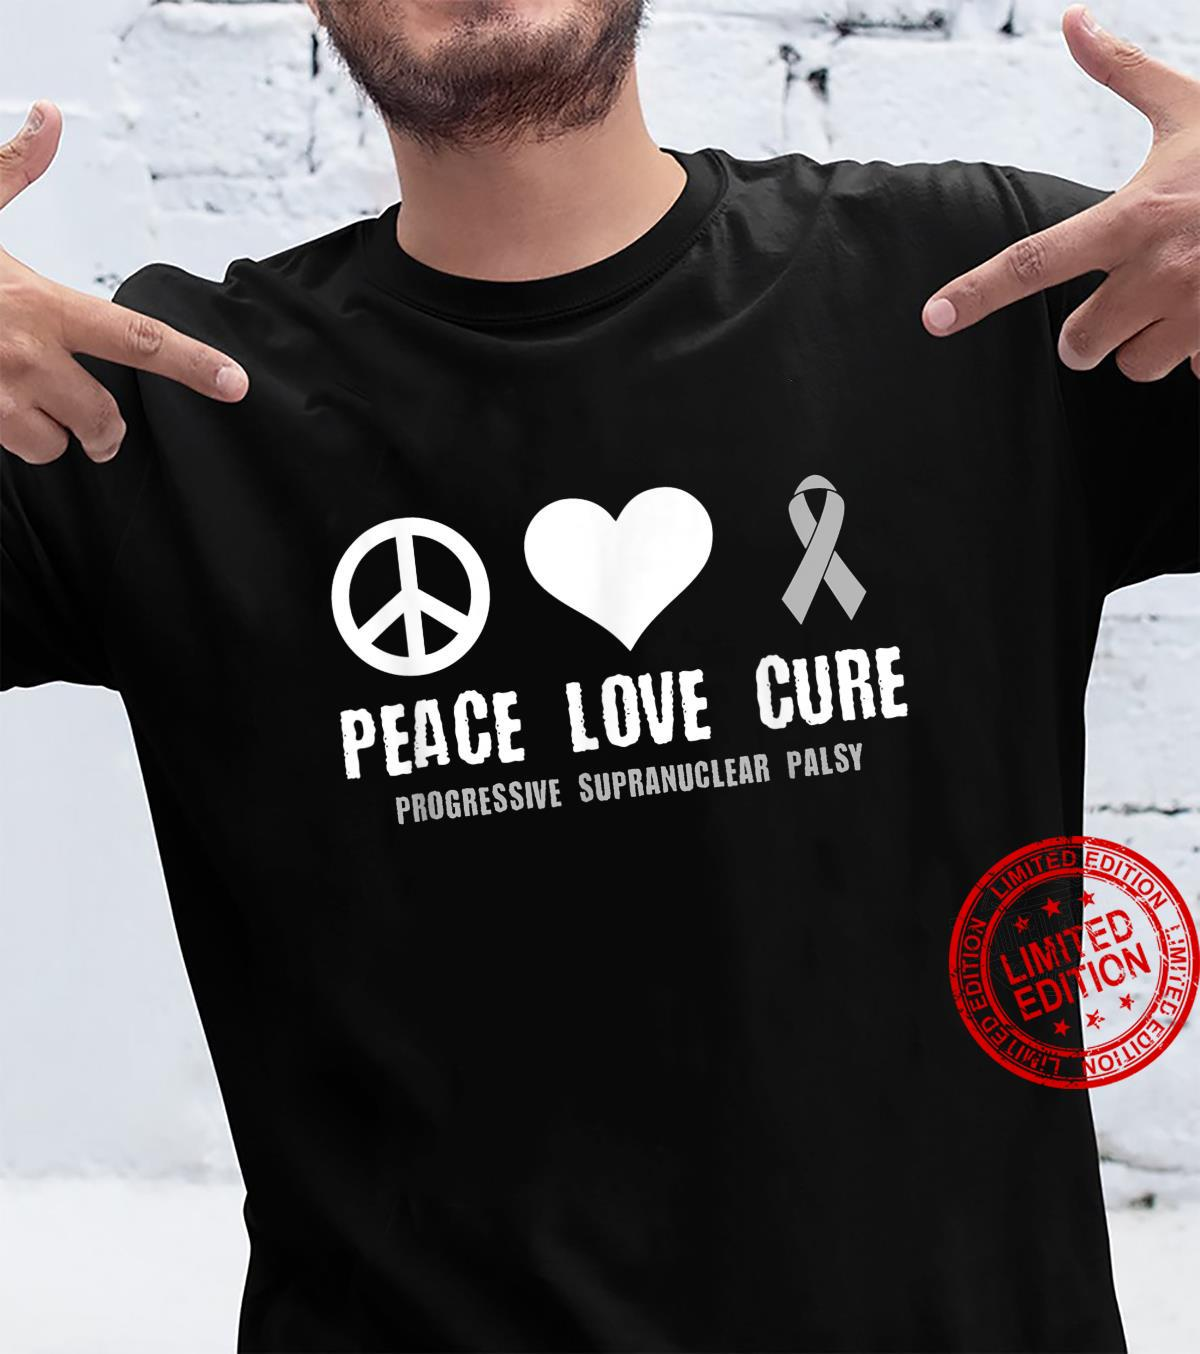 Progressive Supranuclear Palsy Awareness Brain Disease Relat Shirt